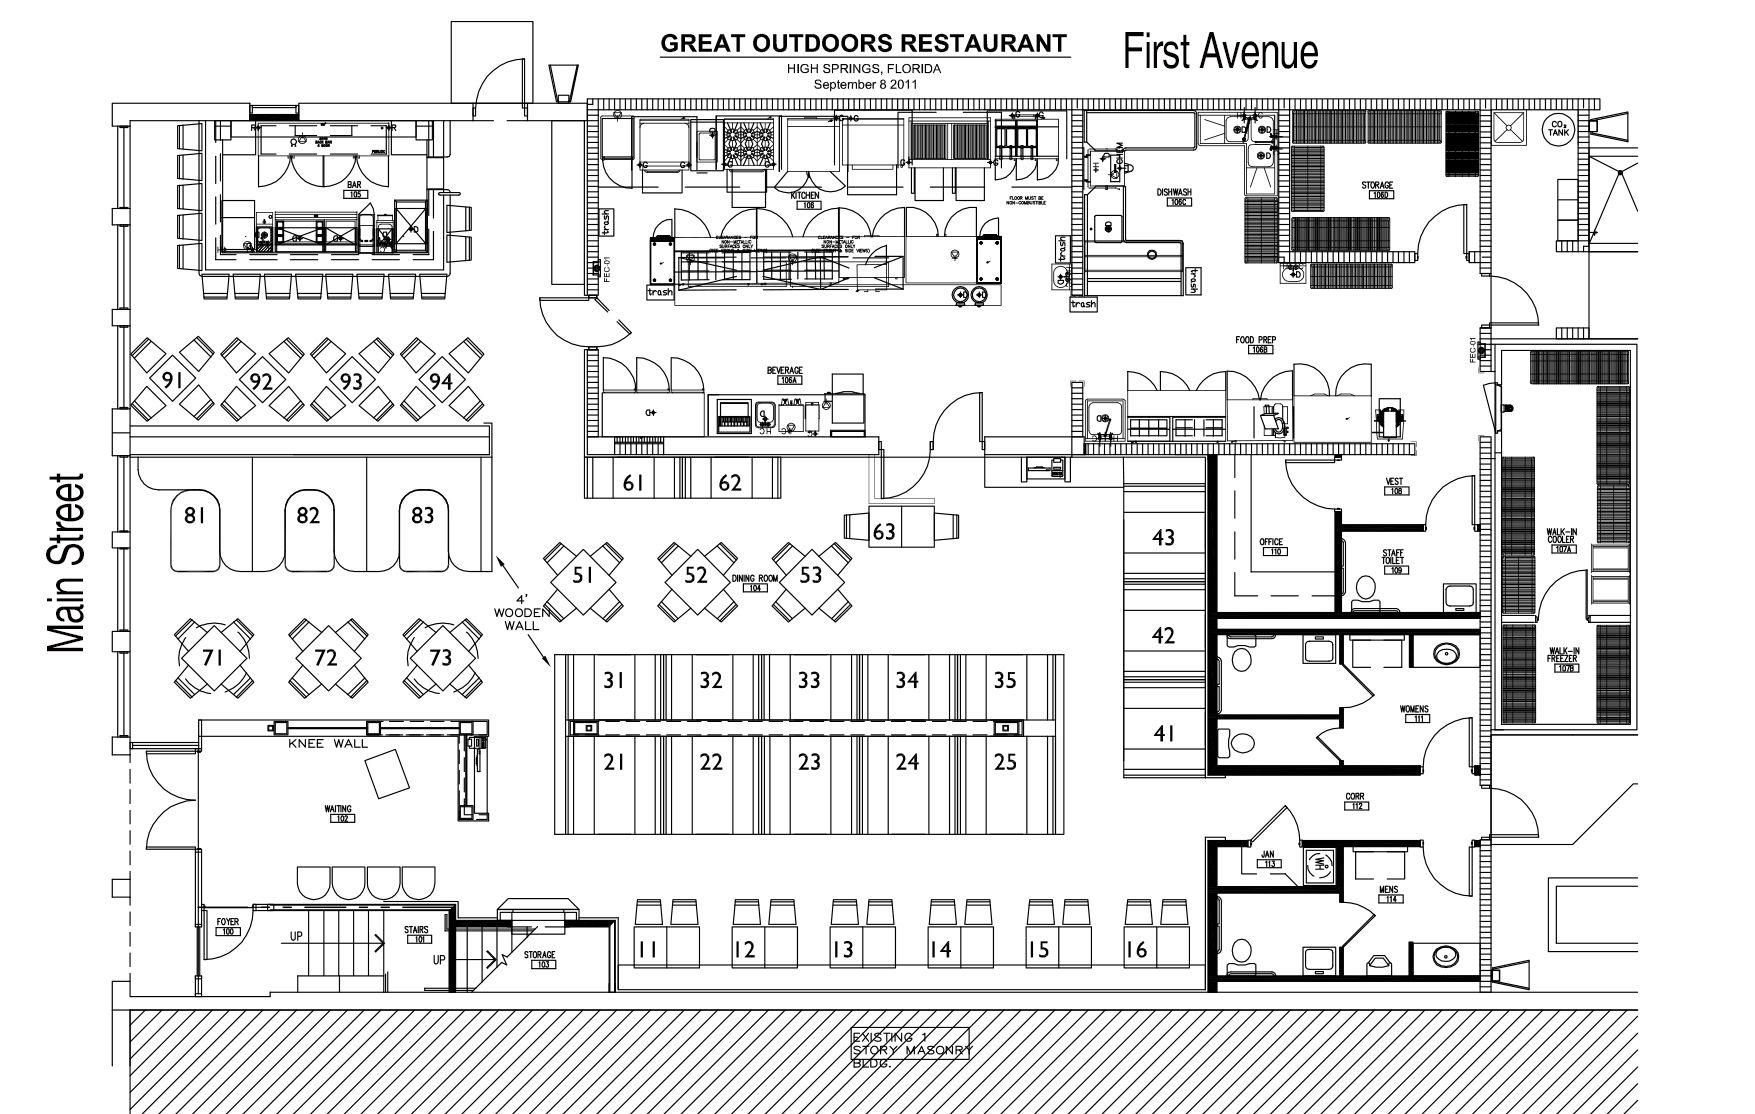 restaurant interior design floor plan  Tm vi Google